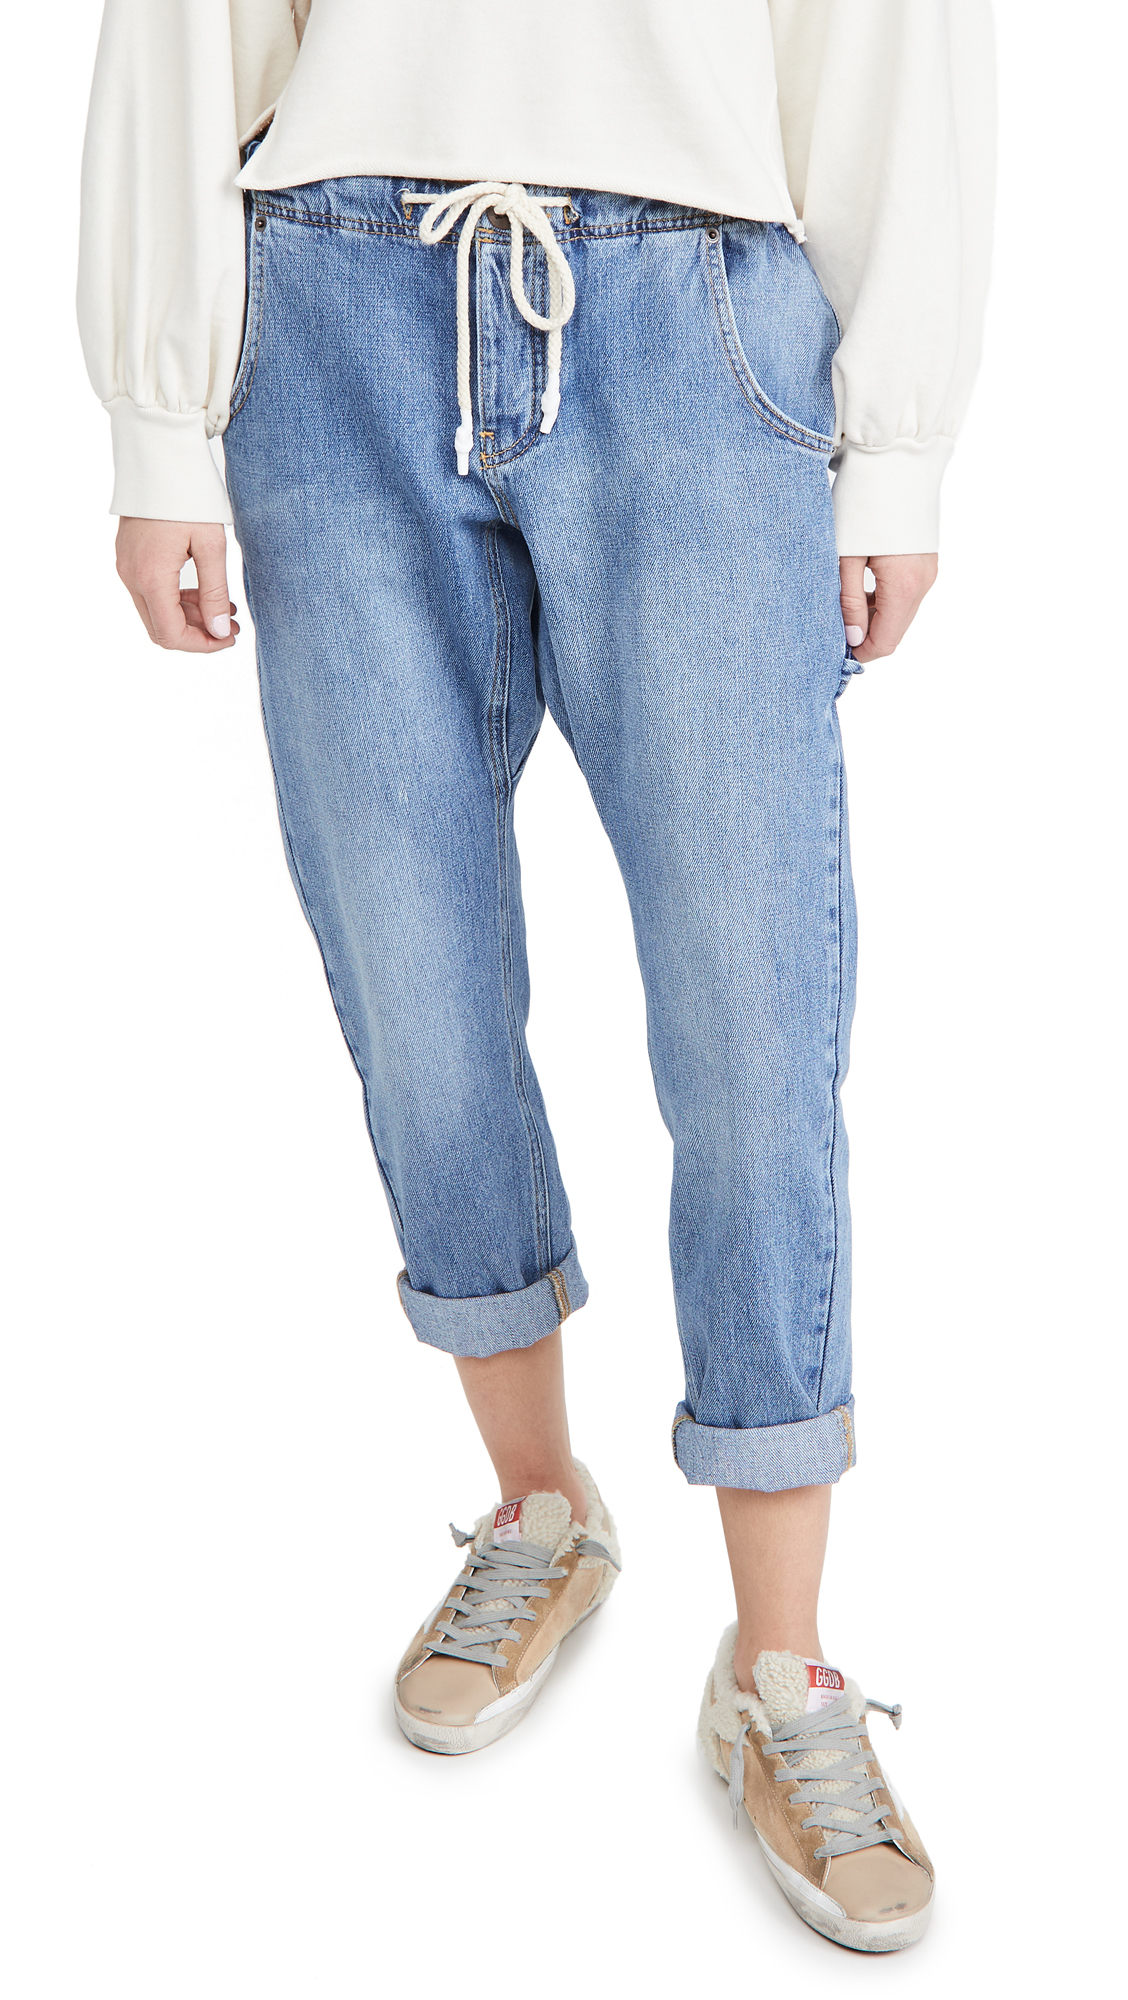 One Teaspoon Workwear Shabbies Boyfriend Jeans